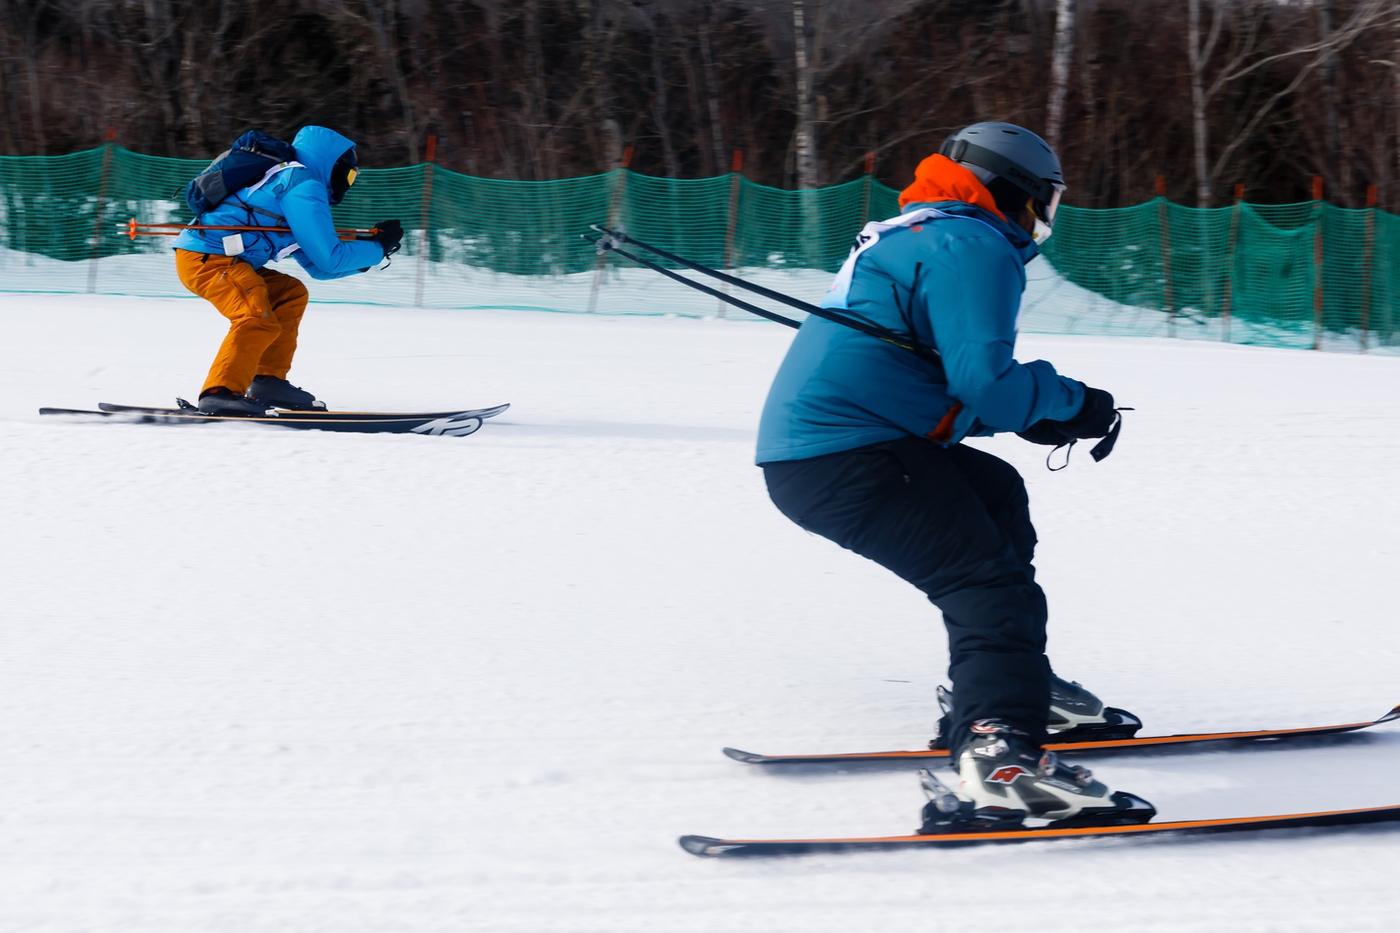 WinterKids Downhill 24 2021 SDP 3441